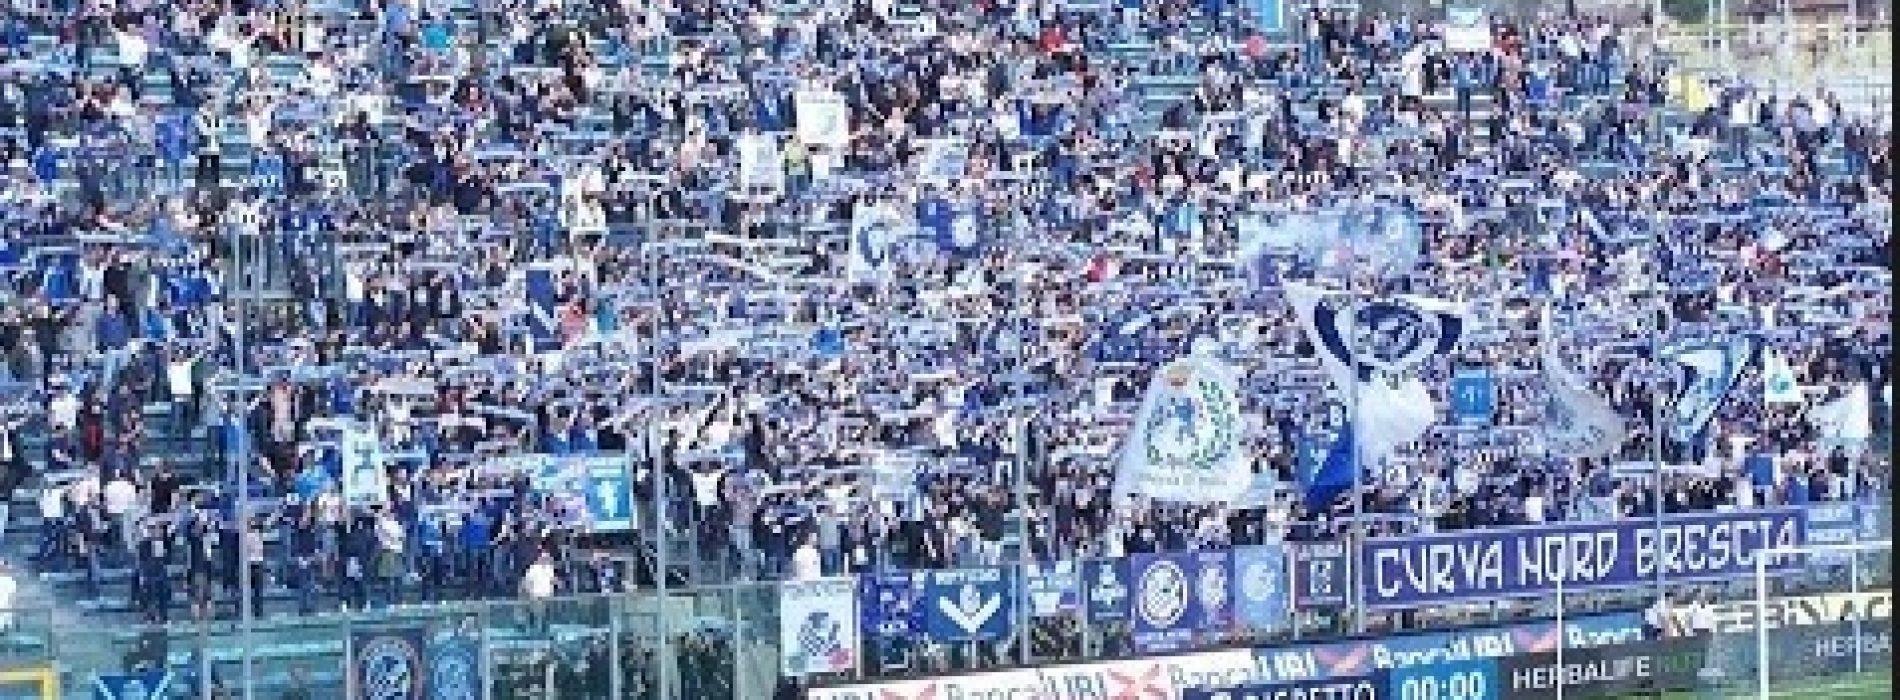 Serie B, il Brescia torna in Serie A!